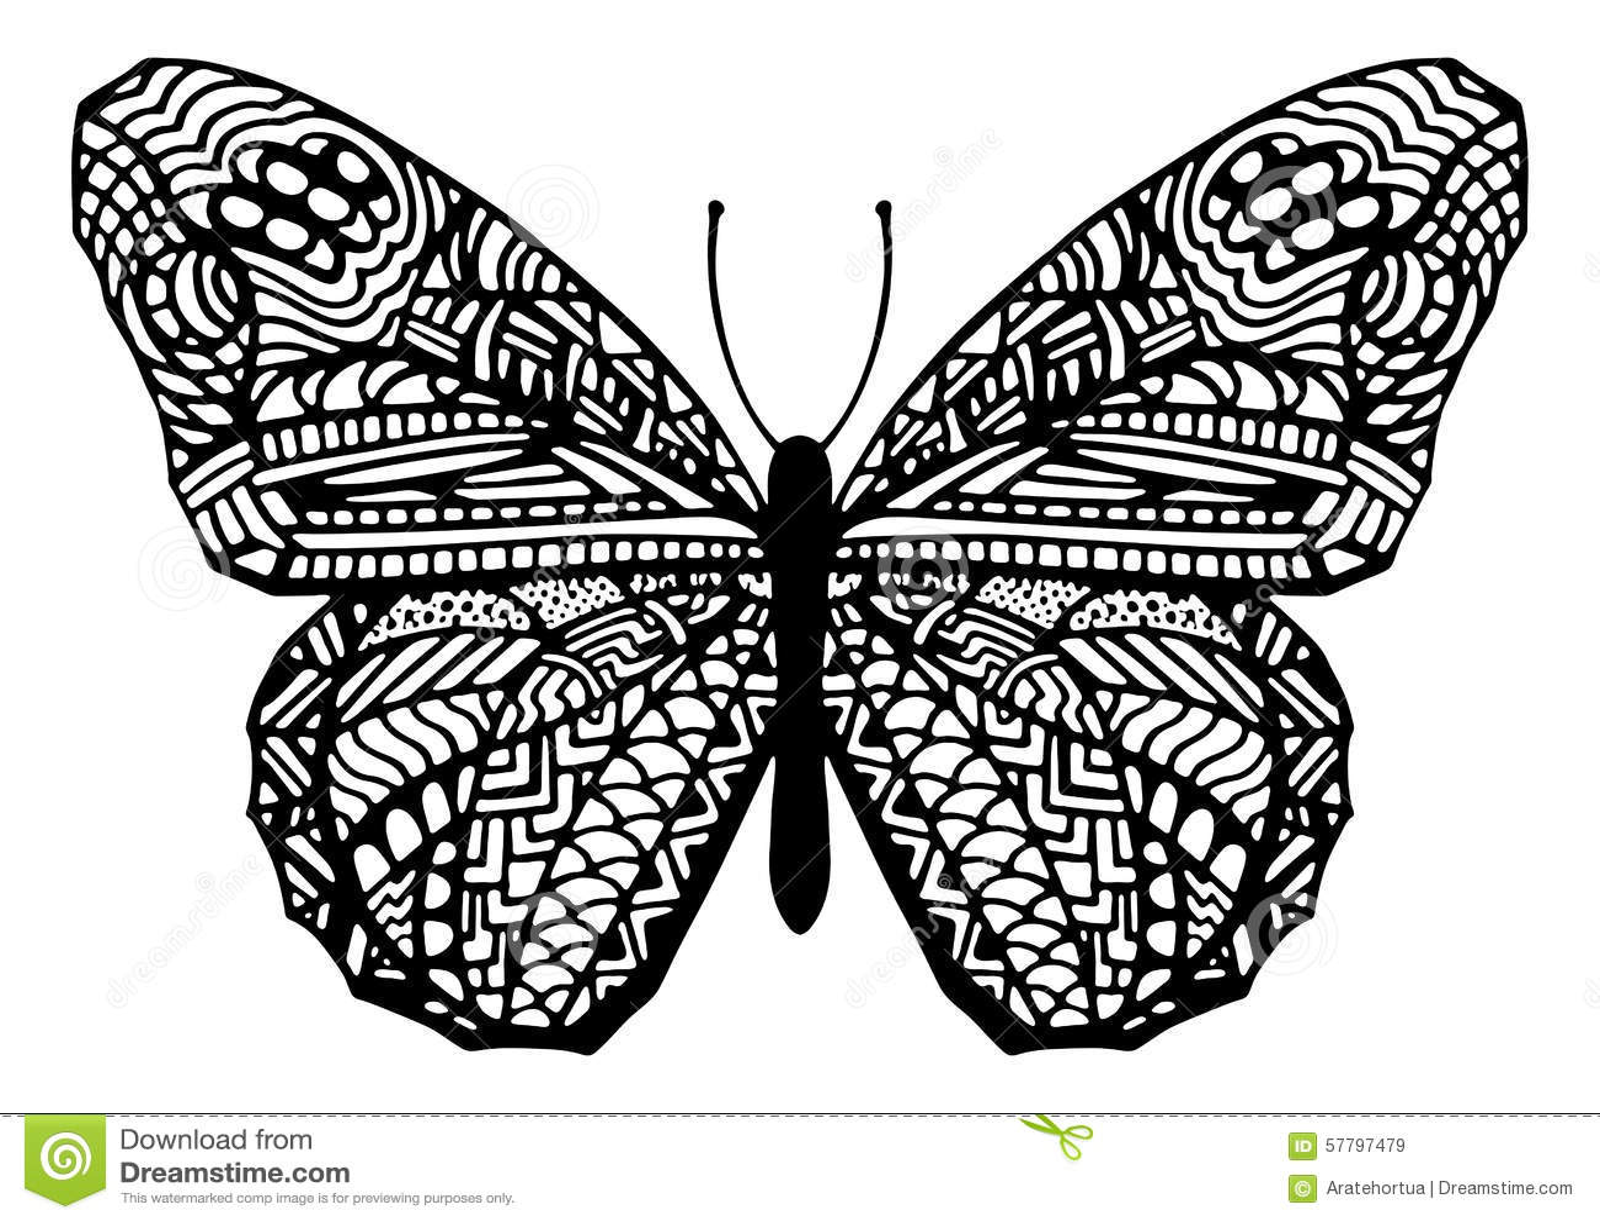 Zentangle Designs Butterflies Www Imgkid Com The Image